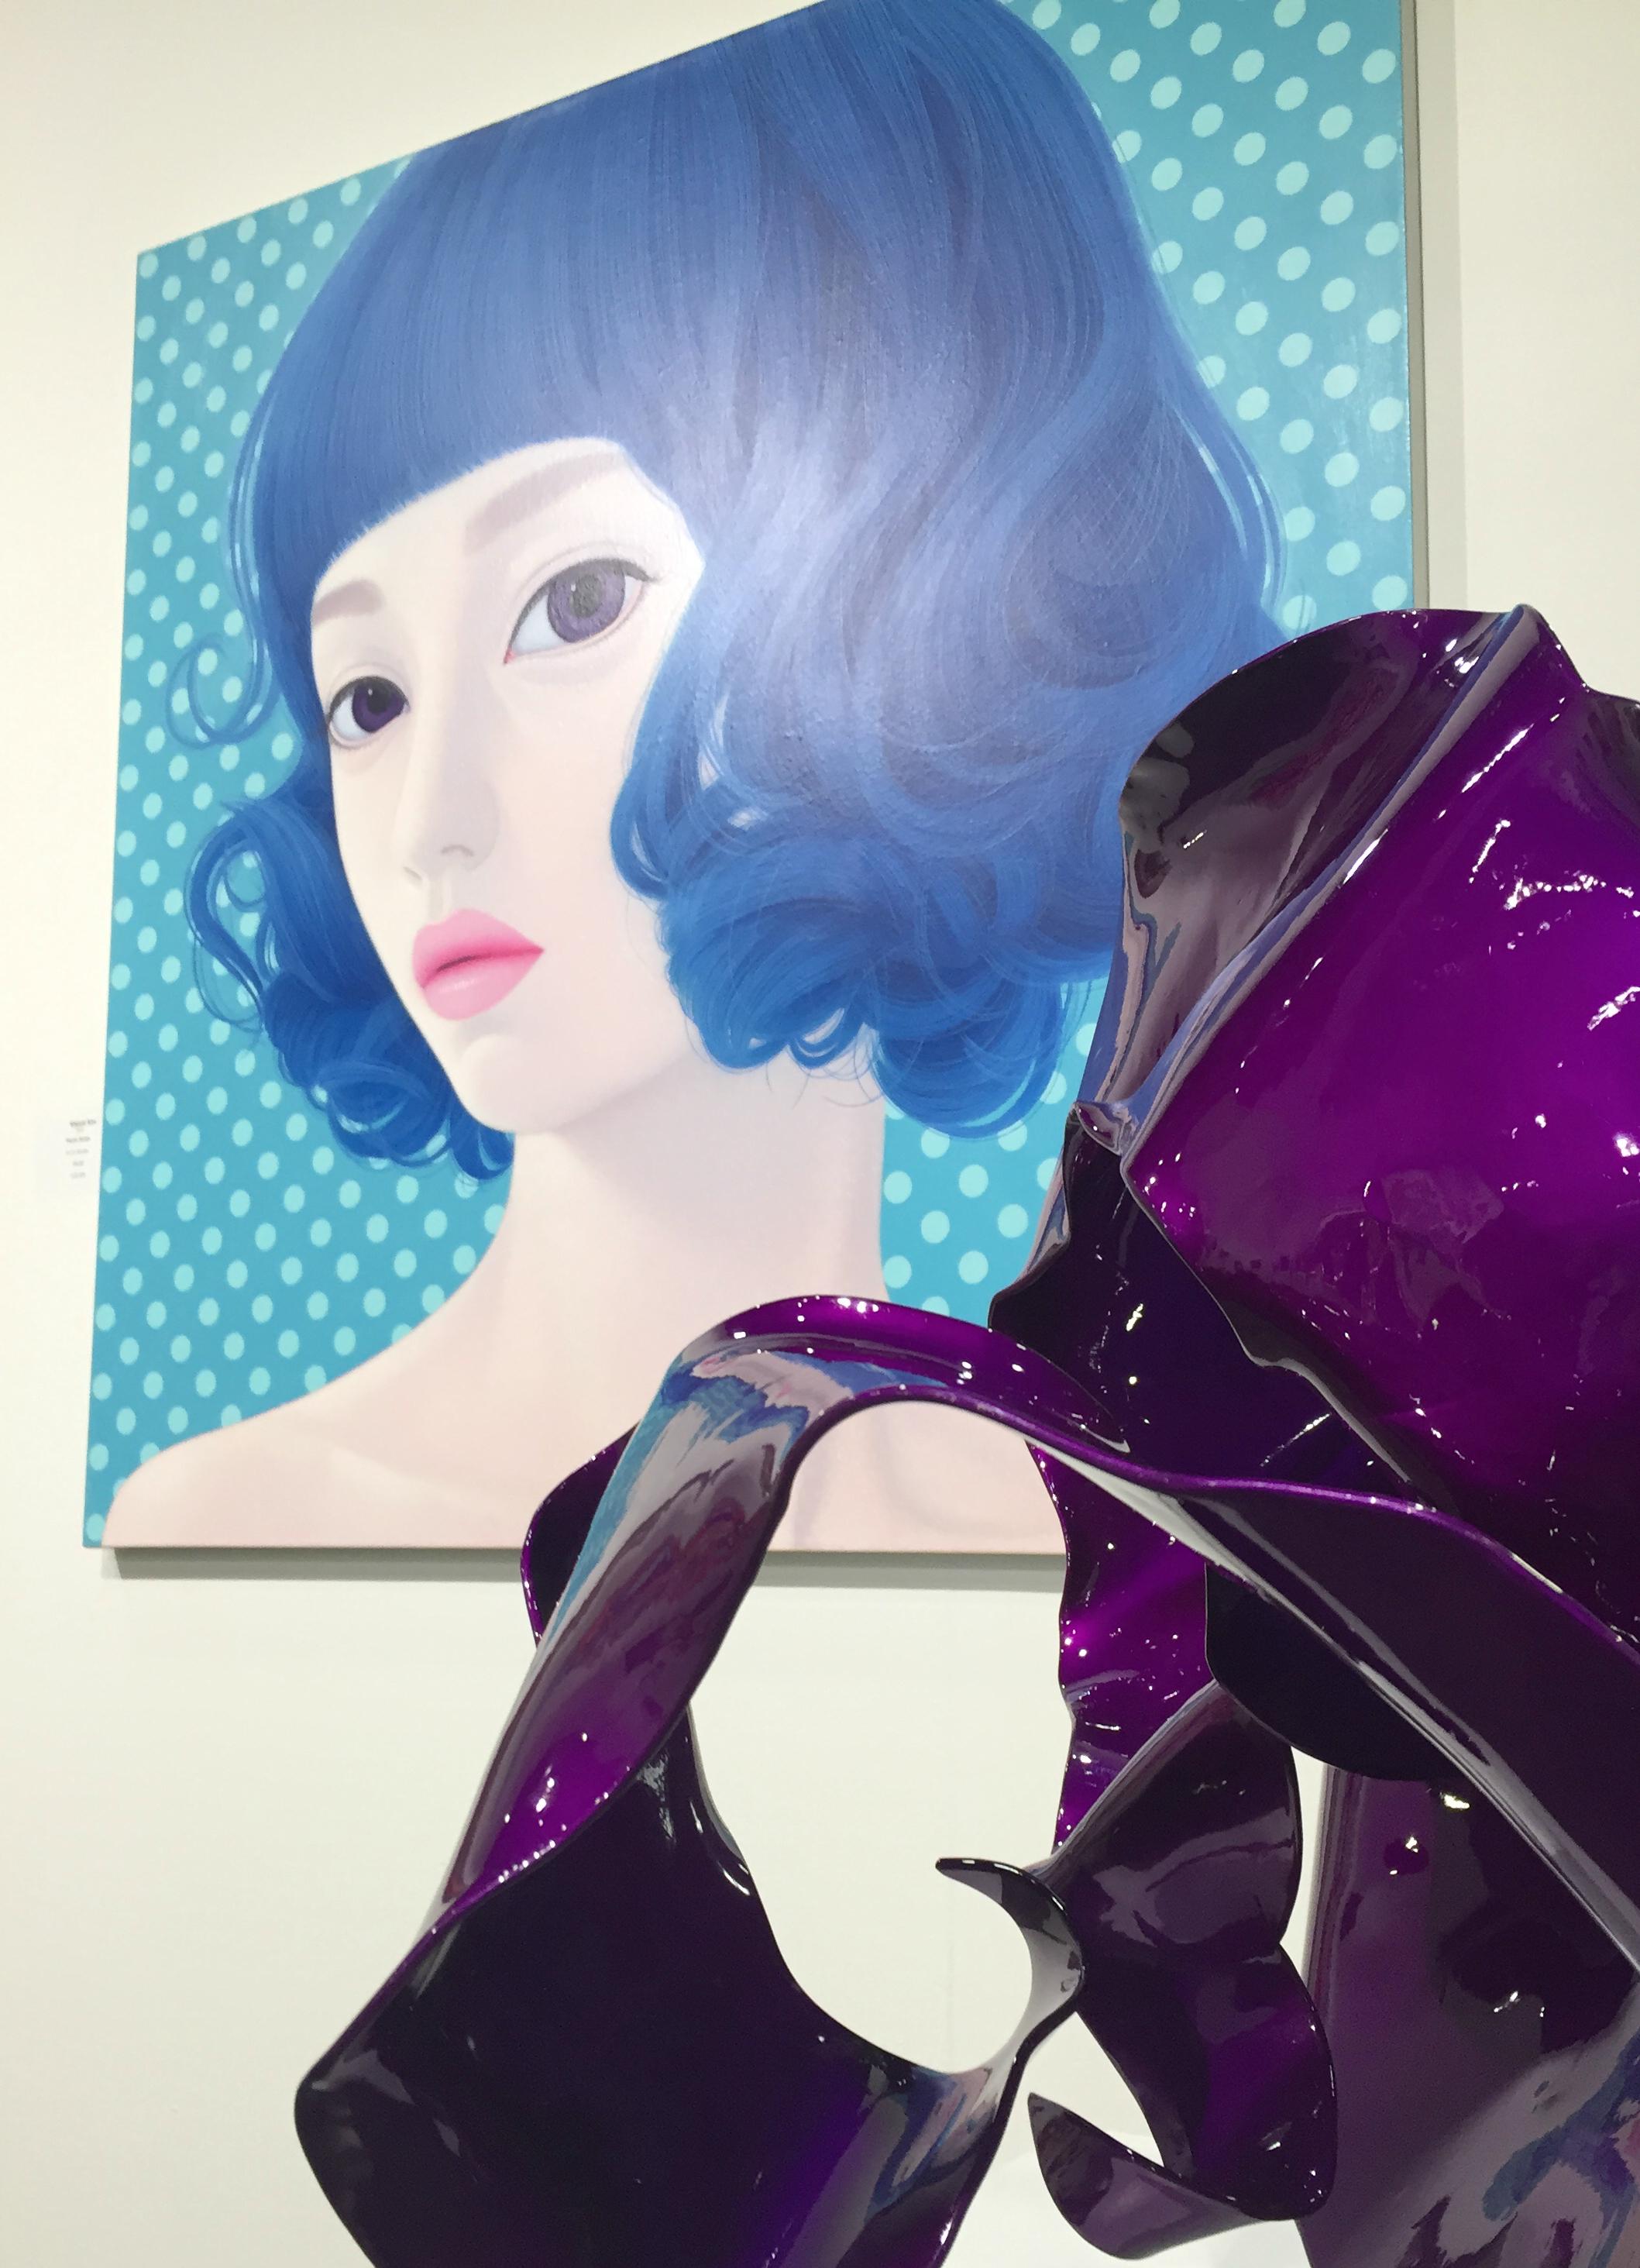 Kiseok Kim (http://www.kiseokkim.com/) and Luis Jimenez (http://galeriacasacuadrada.com/?galleries=luis-jimenez)